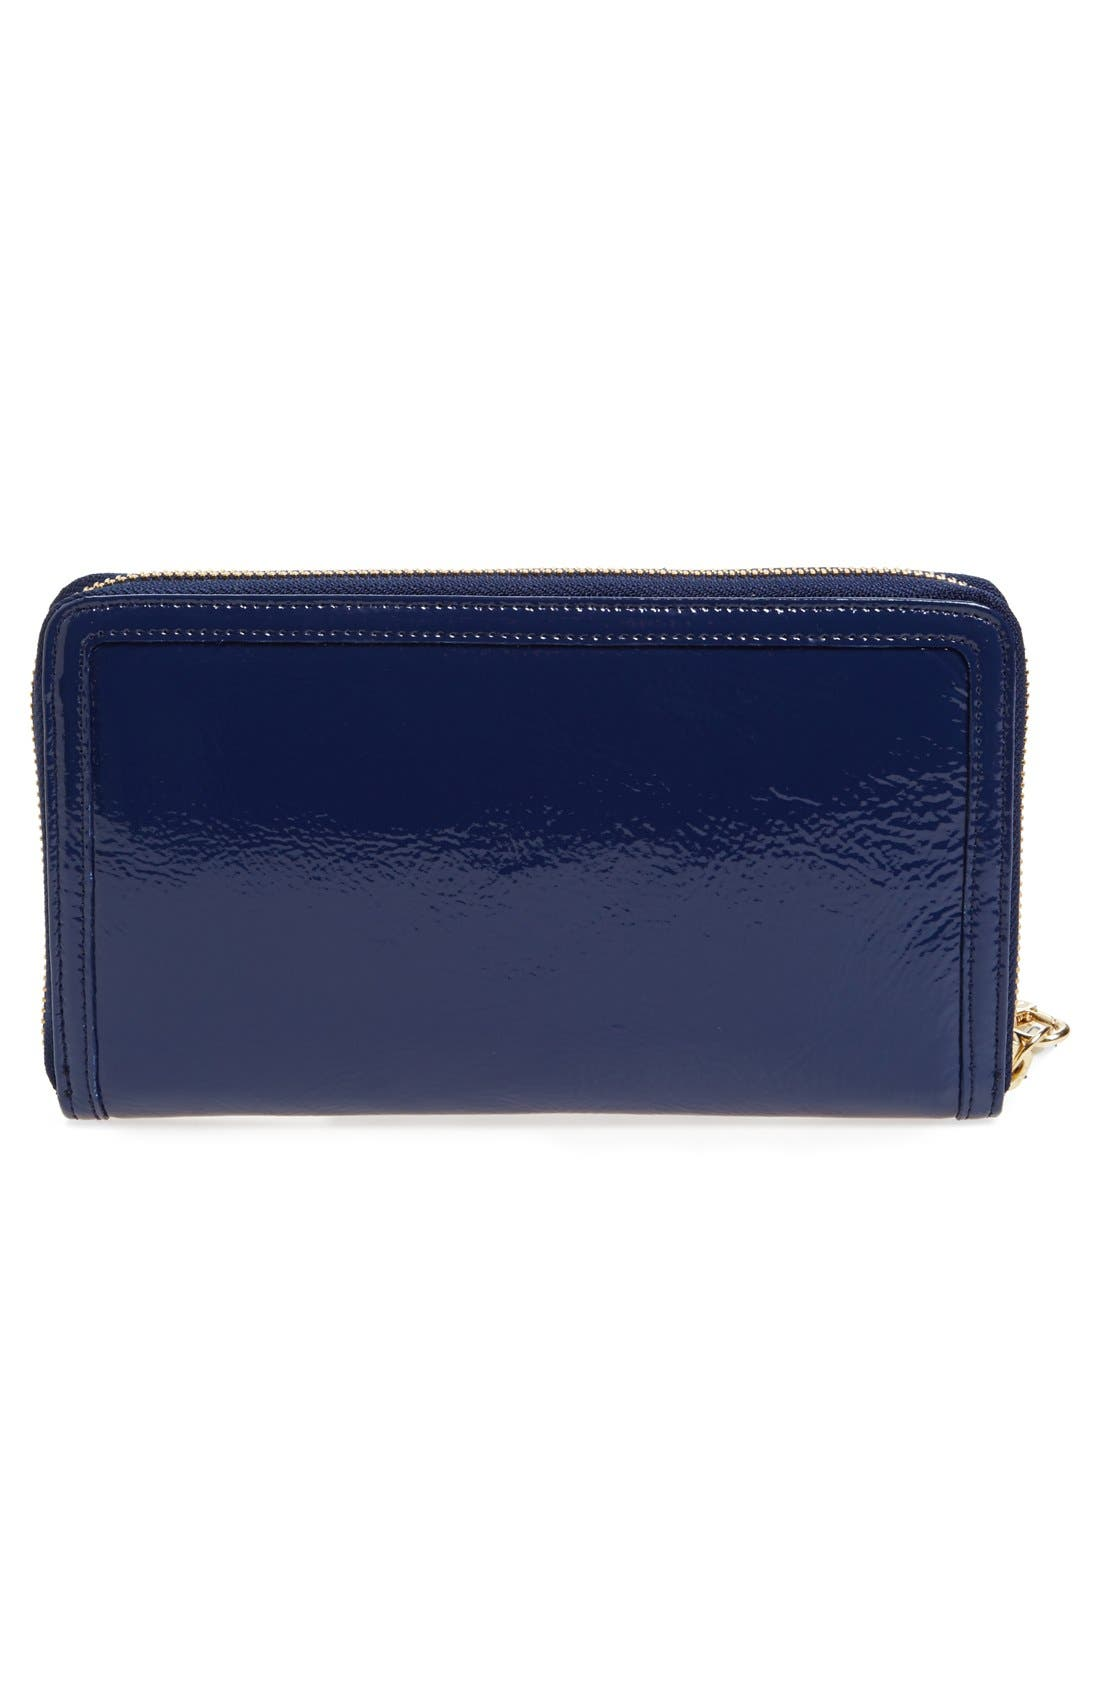 Alternate Image 3  - Halogen® Patent Leather Zip-Around Wallet